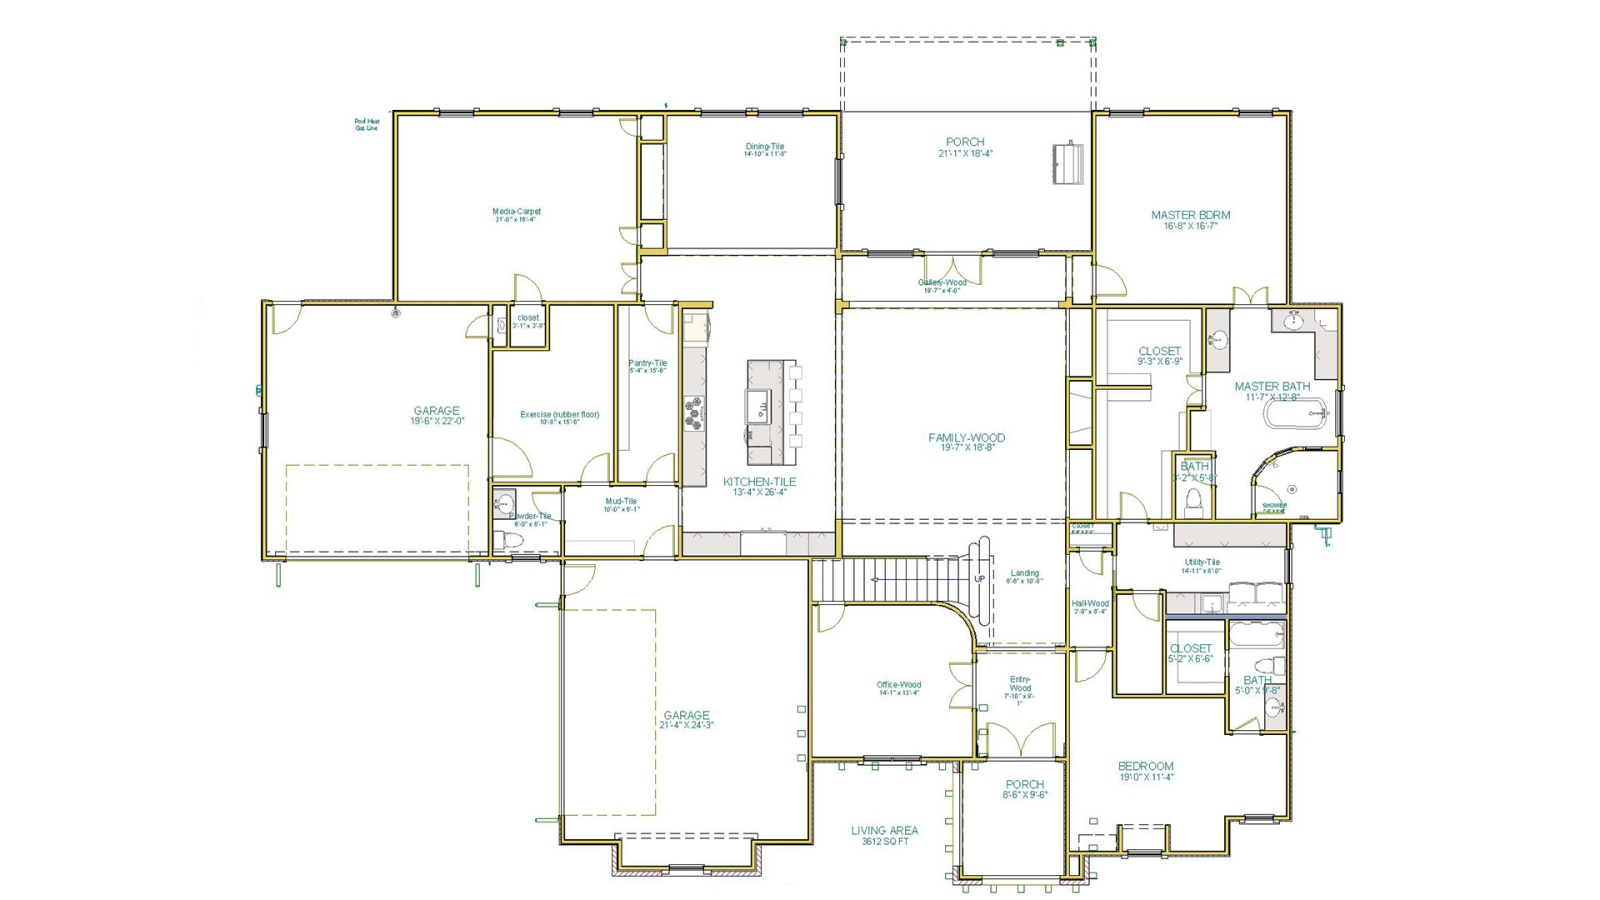 4 Bedrooms Bedrooms, ,5 BathroomsBathrooms,Custom Home,Home Plans,1067